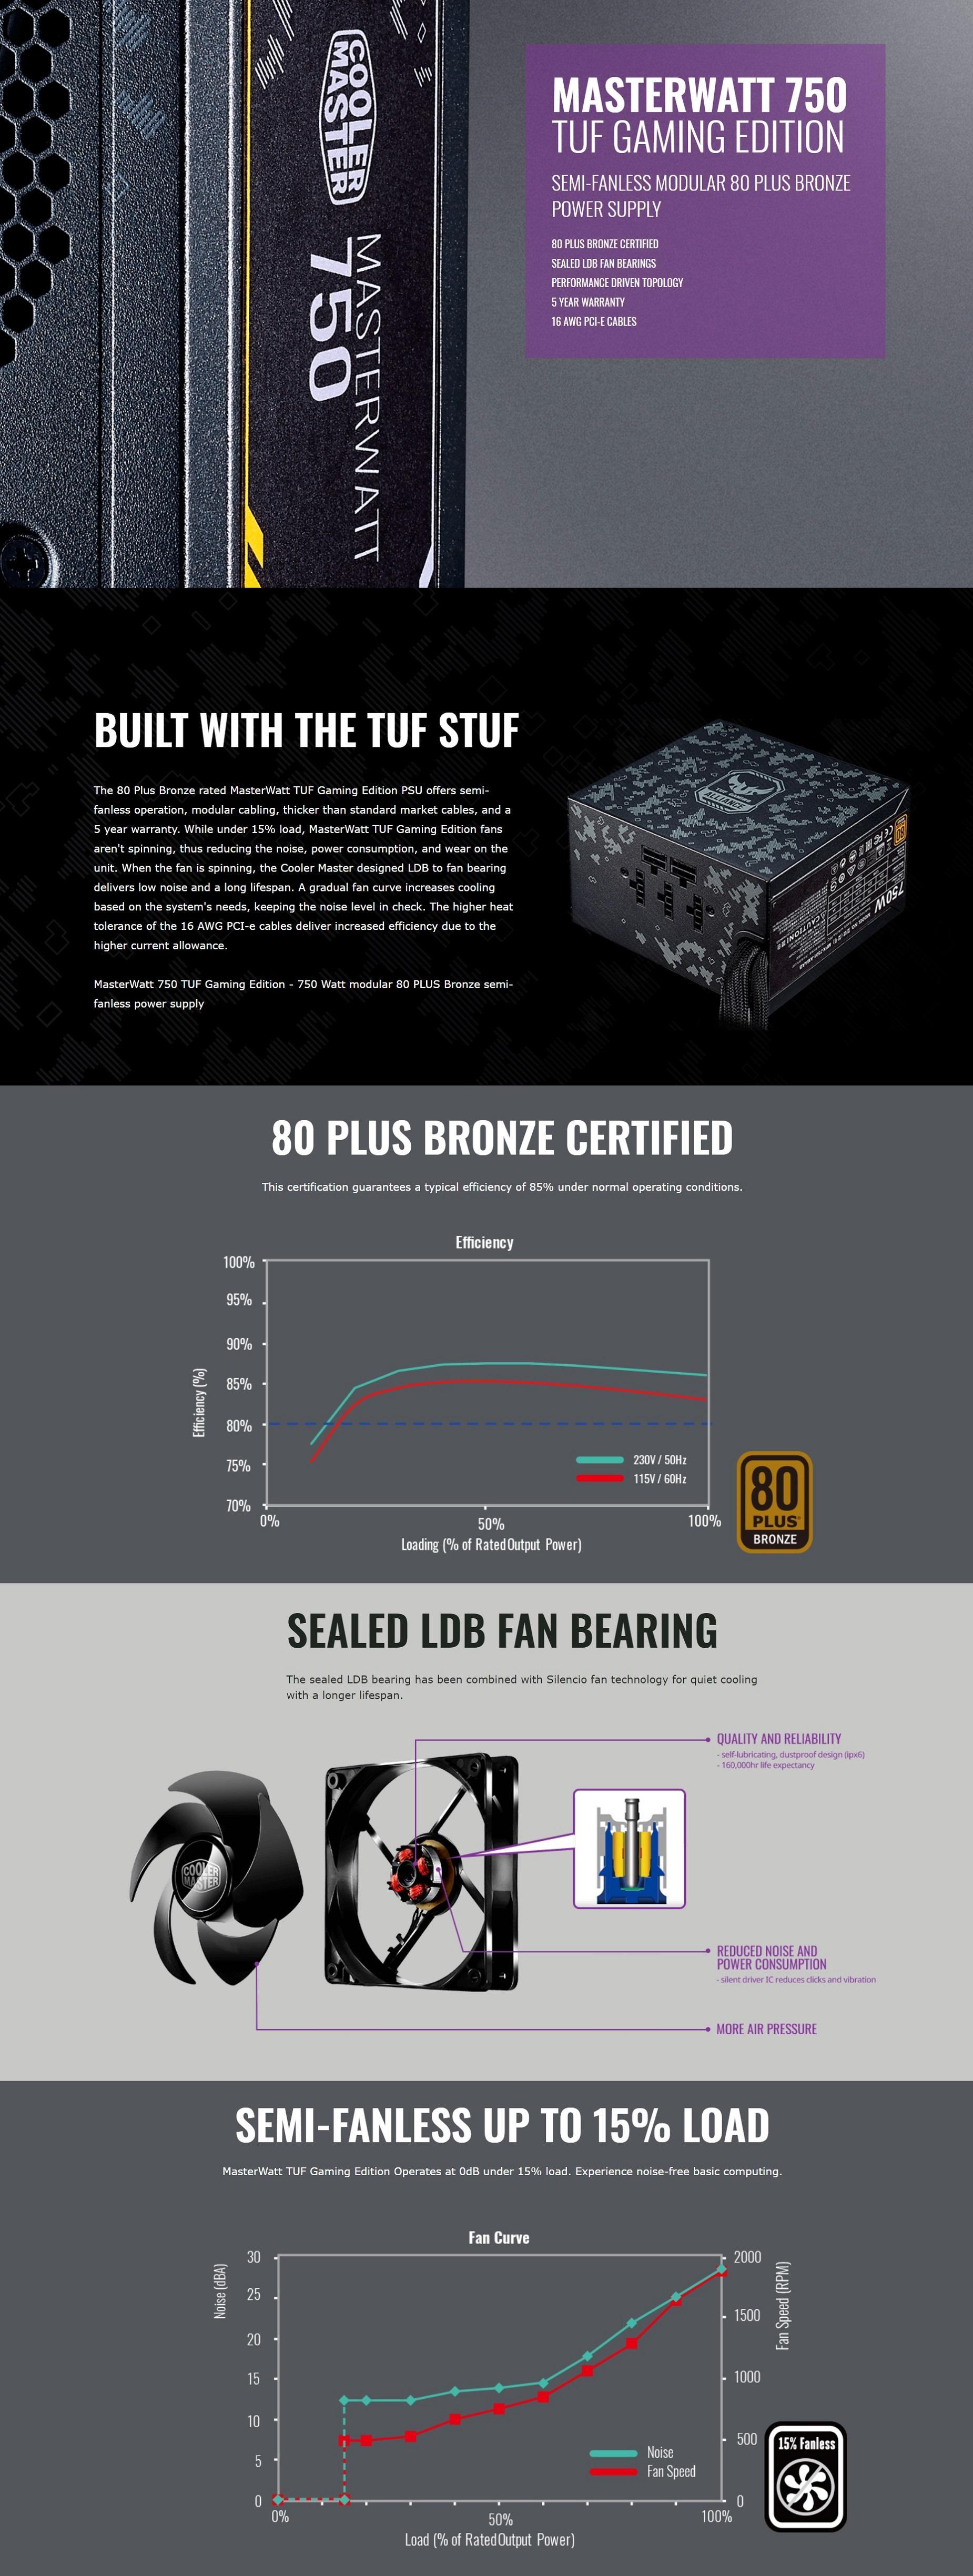 Cooler Master Masterwatt 750 Bronze Semi Fanless Modular Tuf Gaming Mwe Gold 650 80 Full Mpy 6501 Afaag Eu Edition Webpage 01